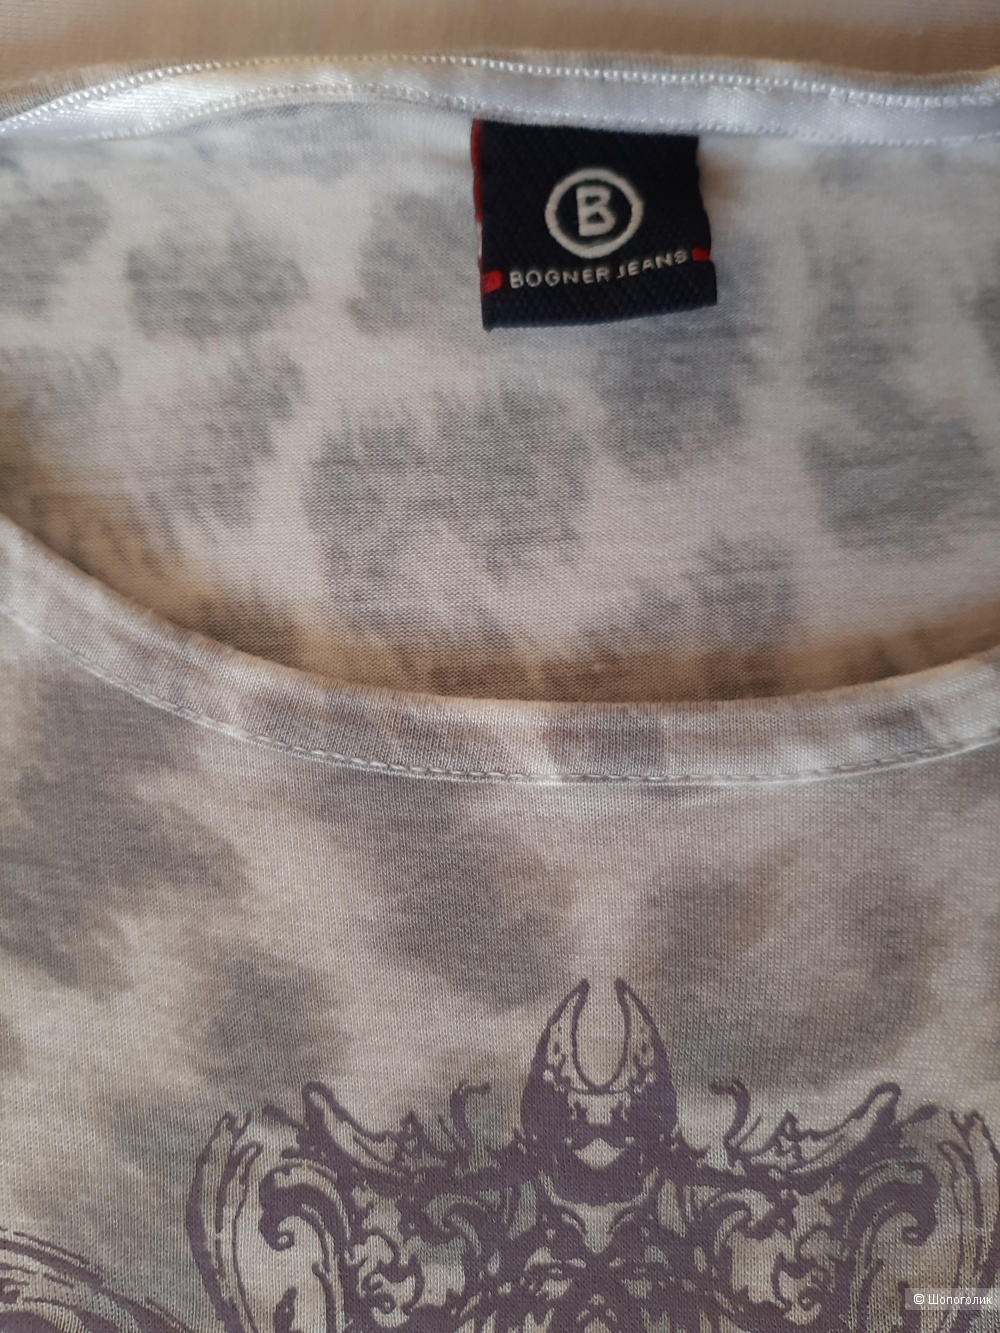 Футболка Bogner Jeans, размер 34